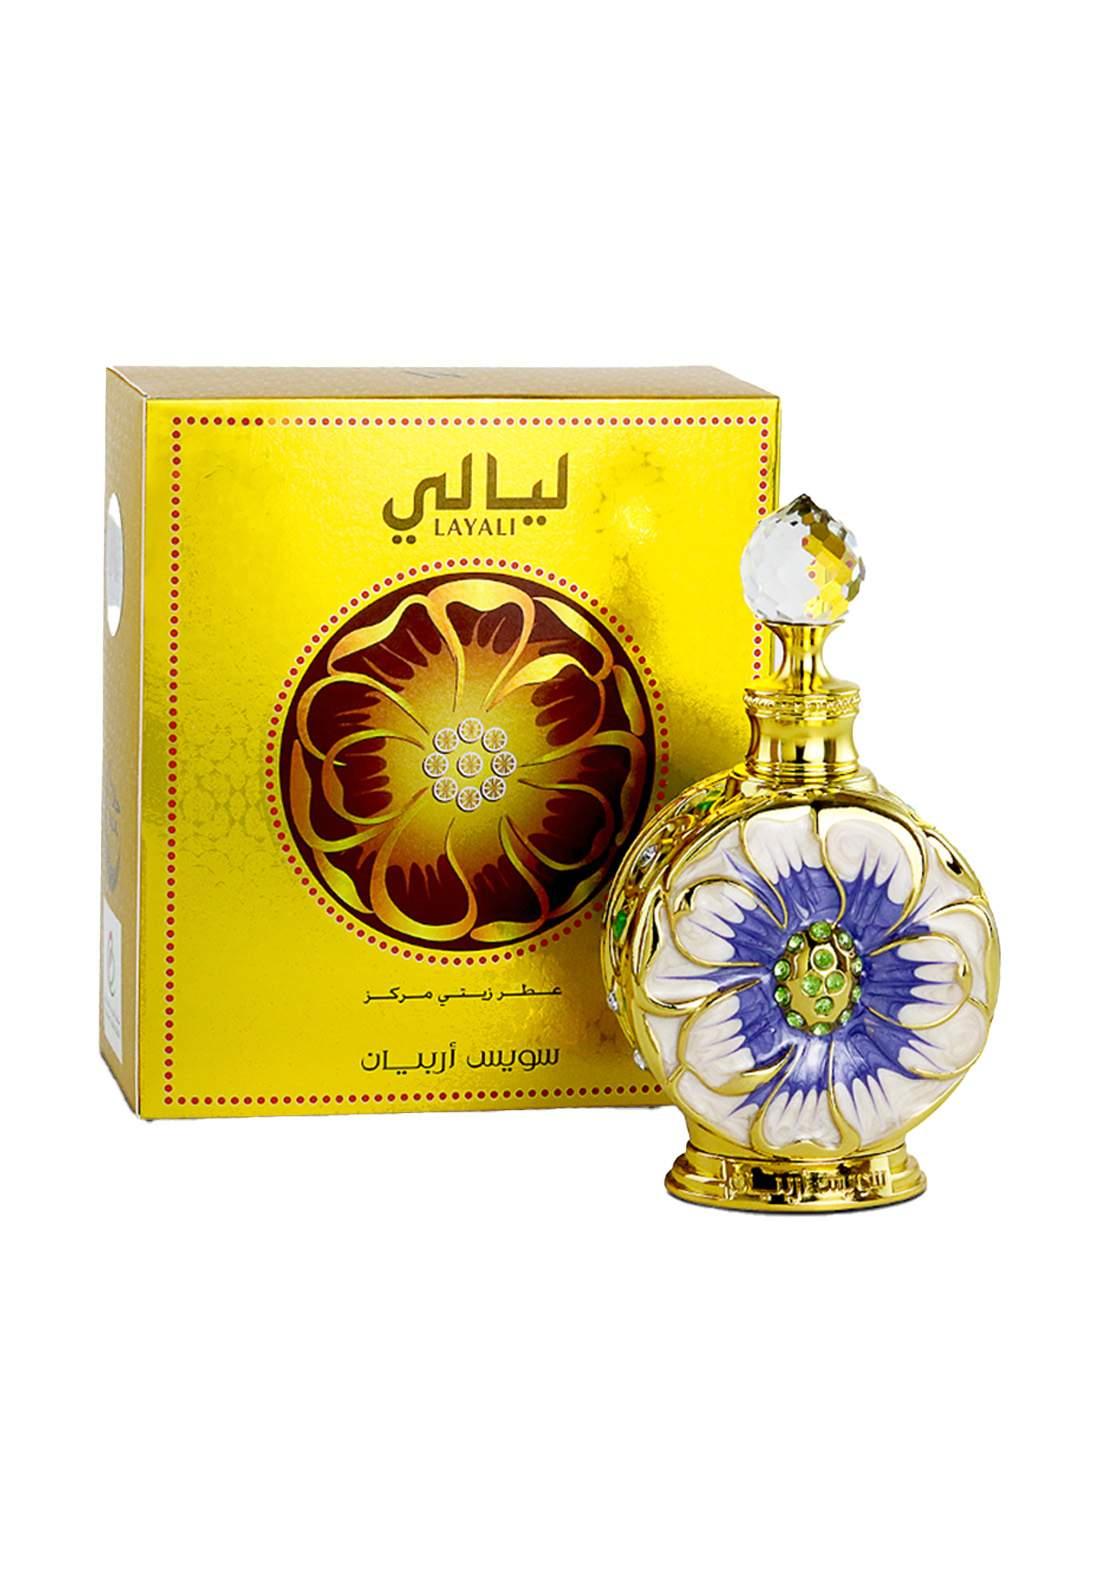 Swiss Arabian 996 Layali  concentrated Perfume Oil  for Unisex-15 ml  عطر لكلا الجنسين